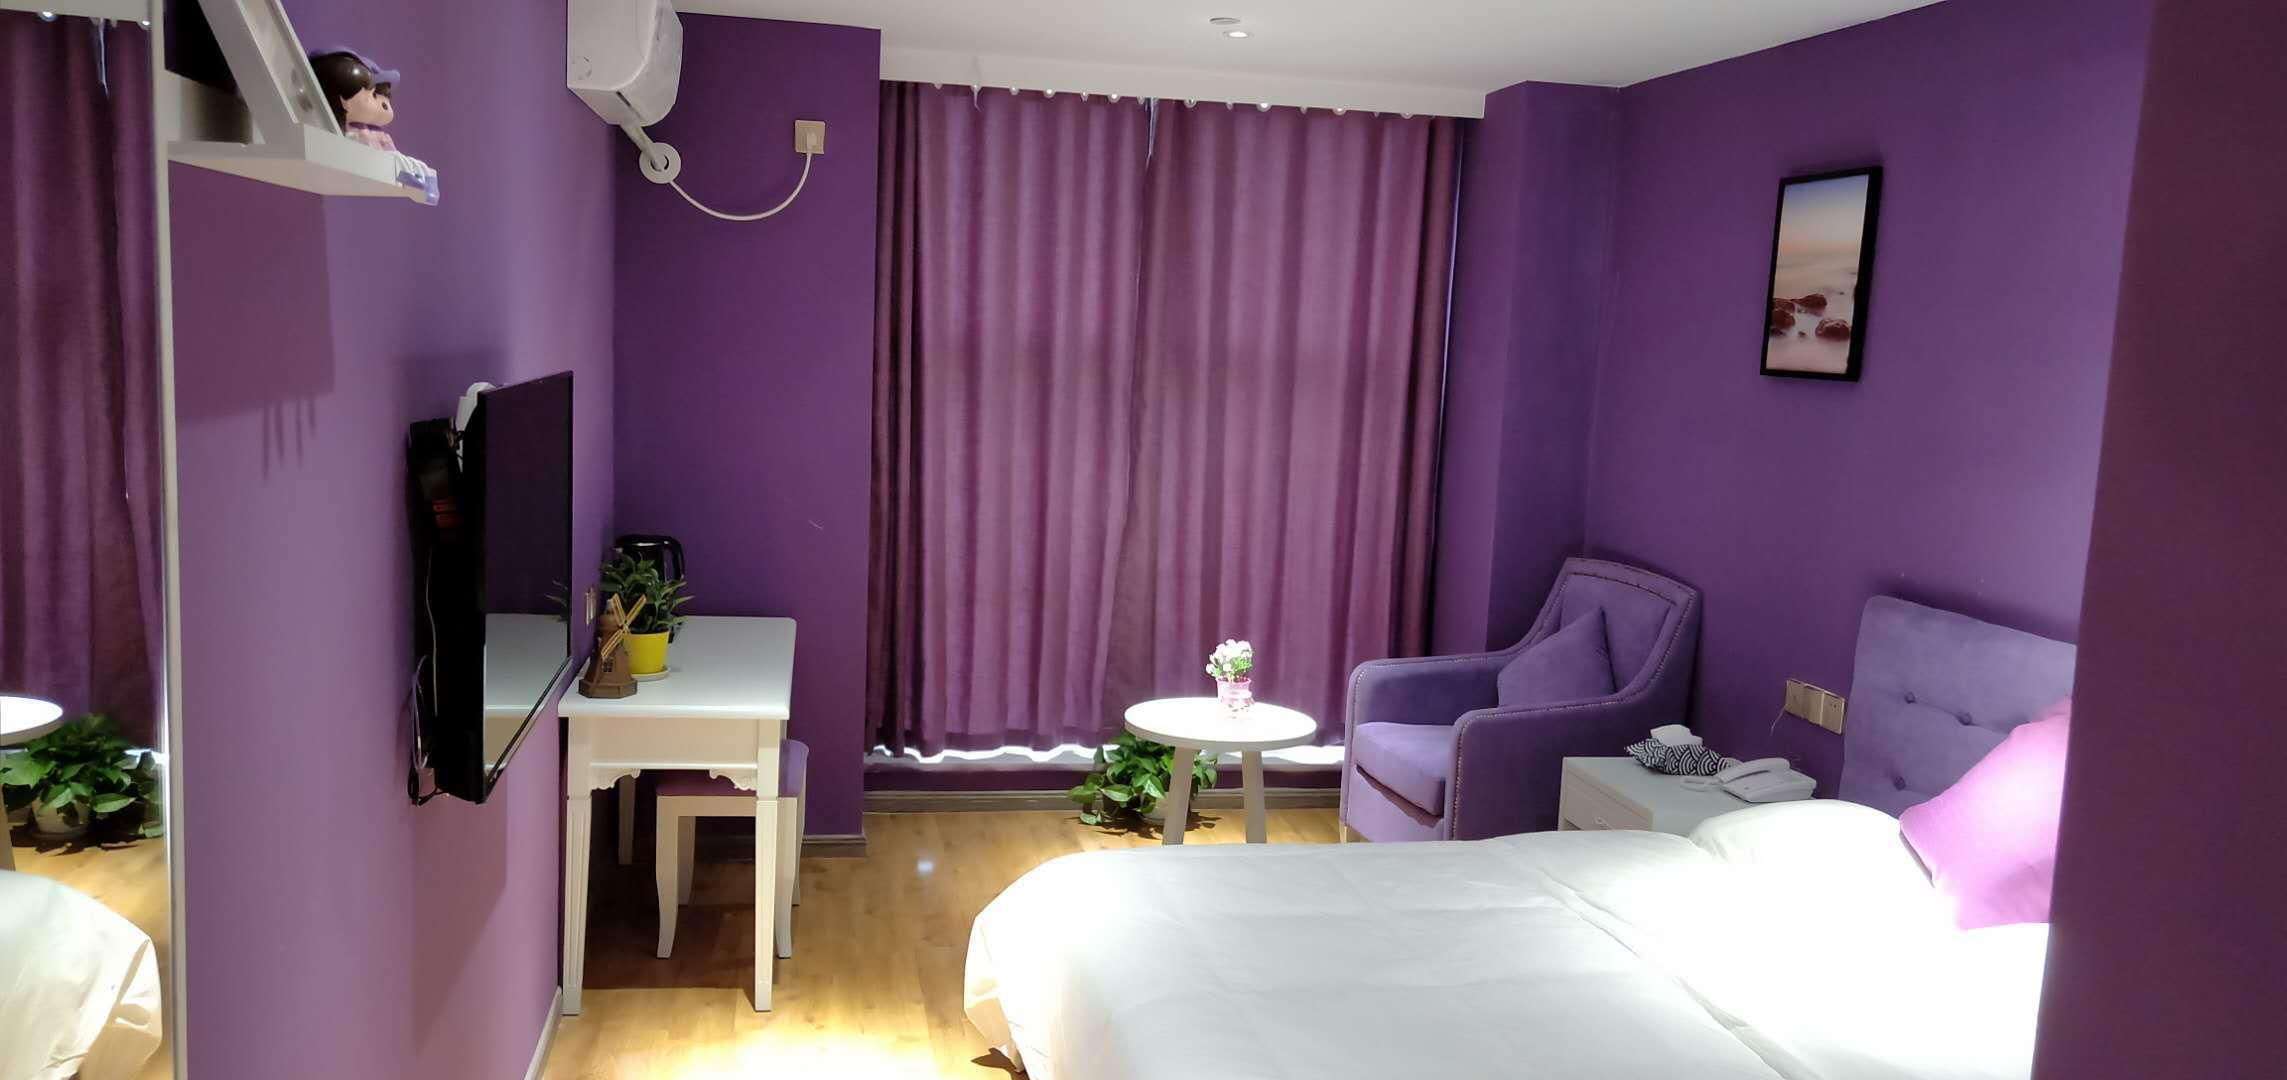 The purple memory of Chengdu Leiya light Residence Hotel